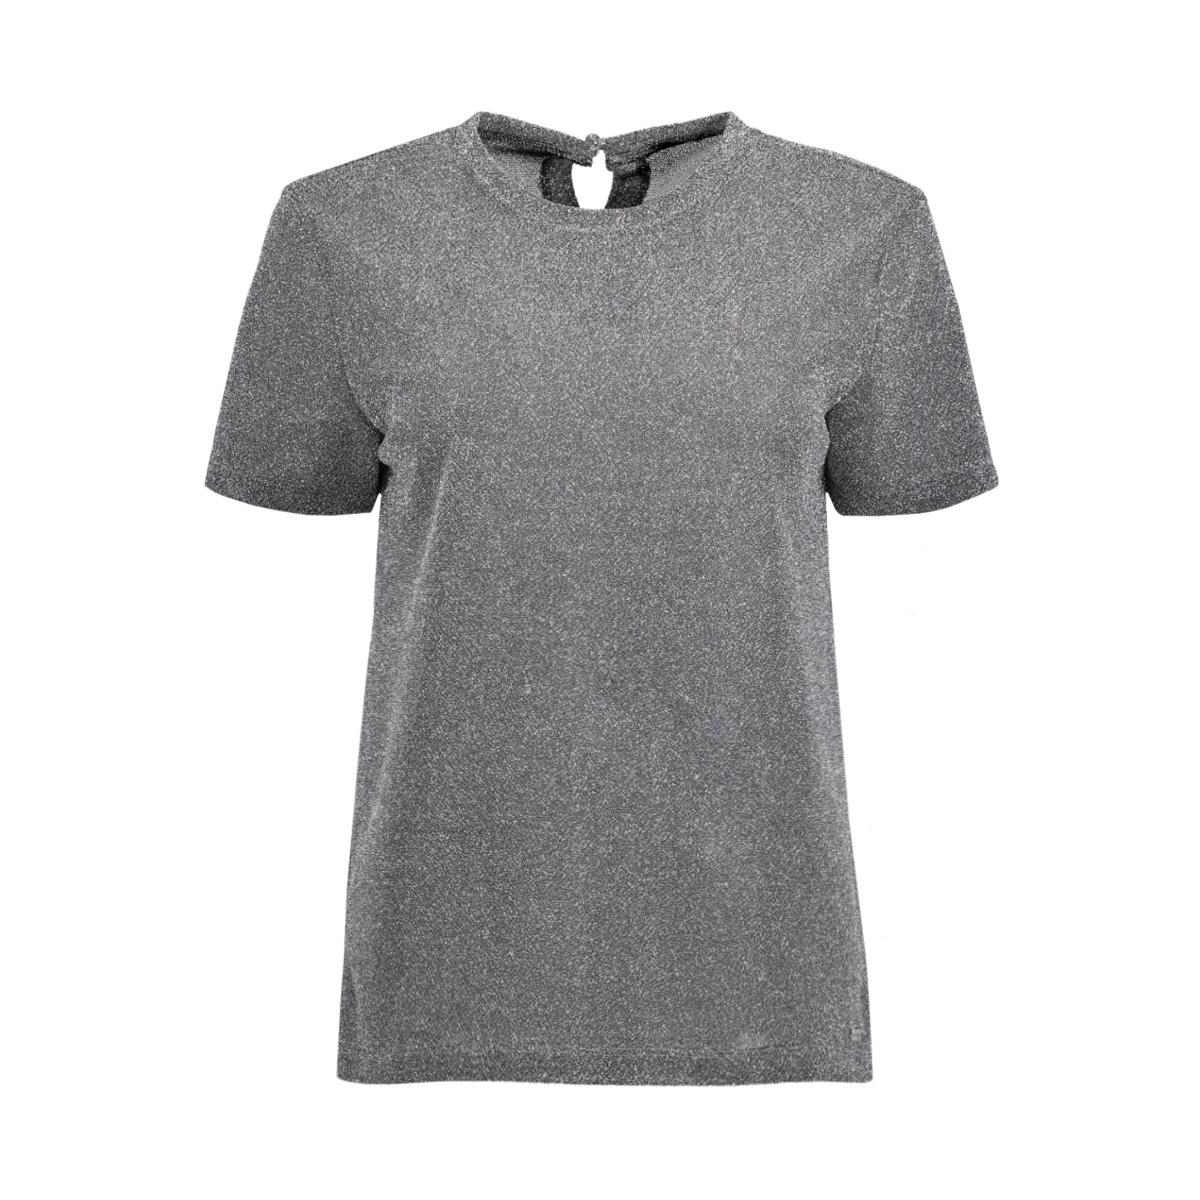 w17.7.1511 rio tee silver circle of trust t-shirt silver